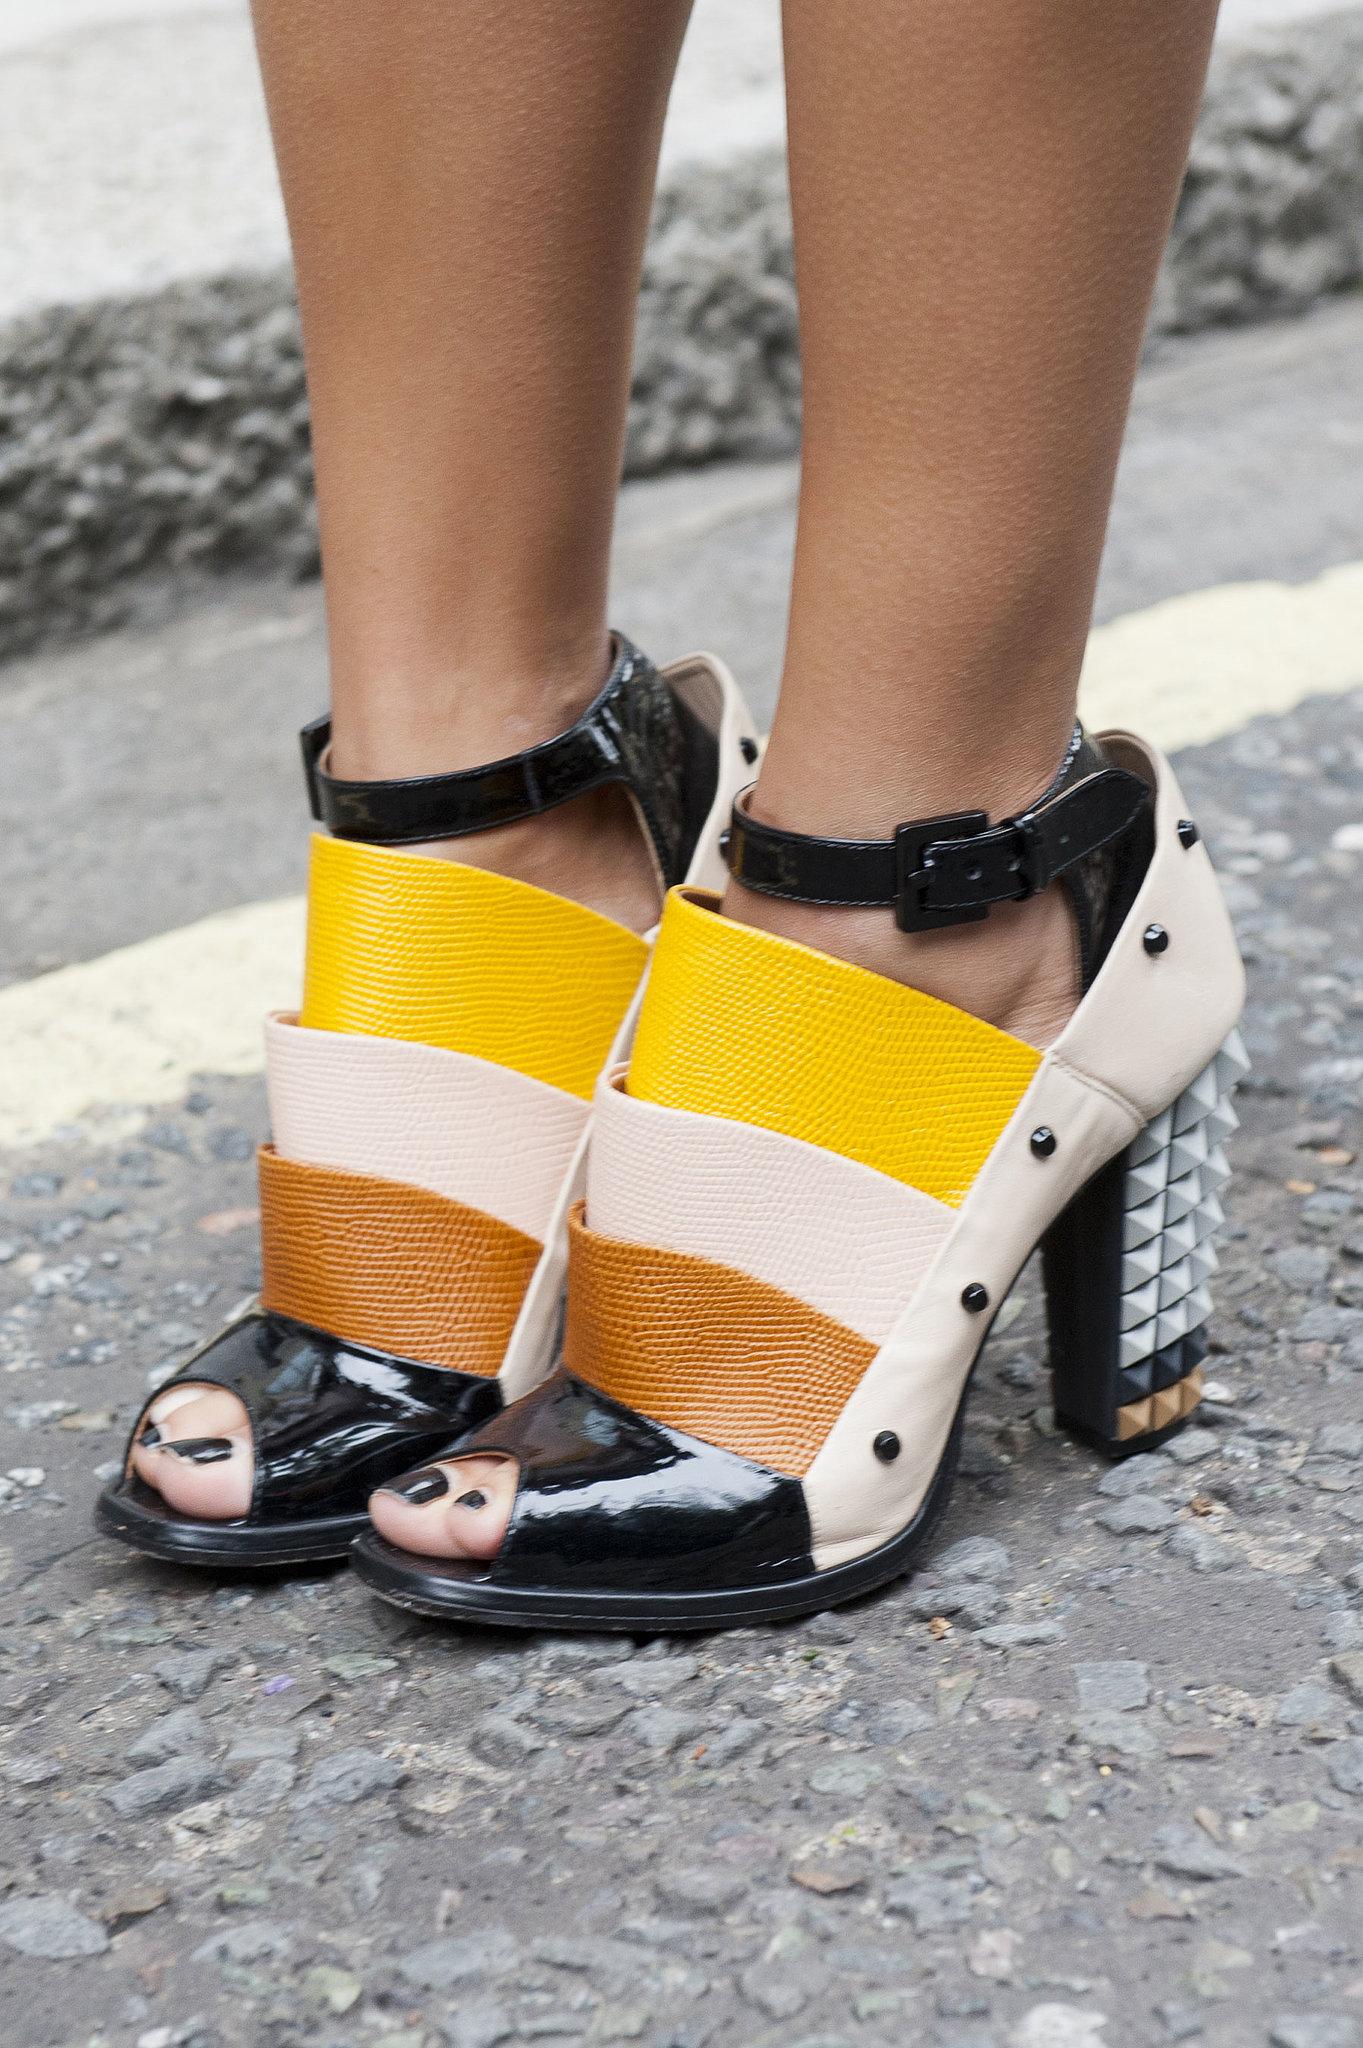 Fendi's heels could brighten up any look.